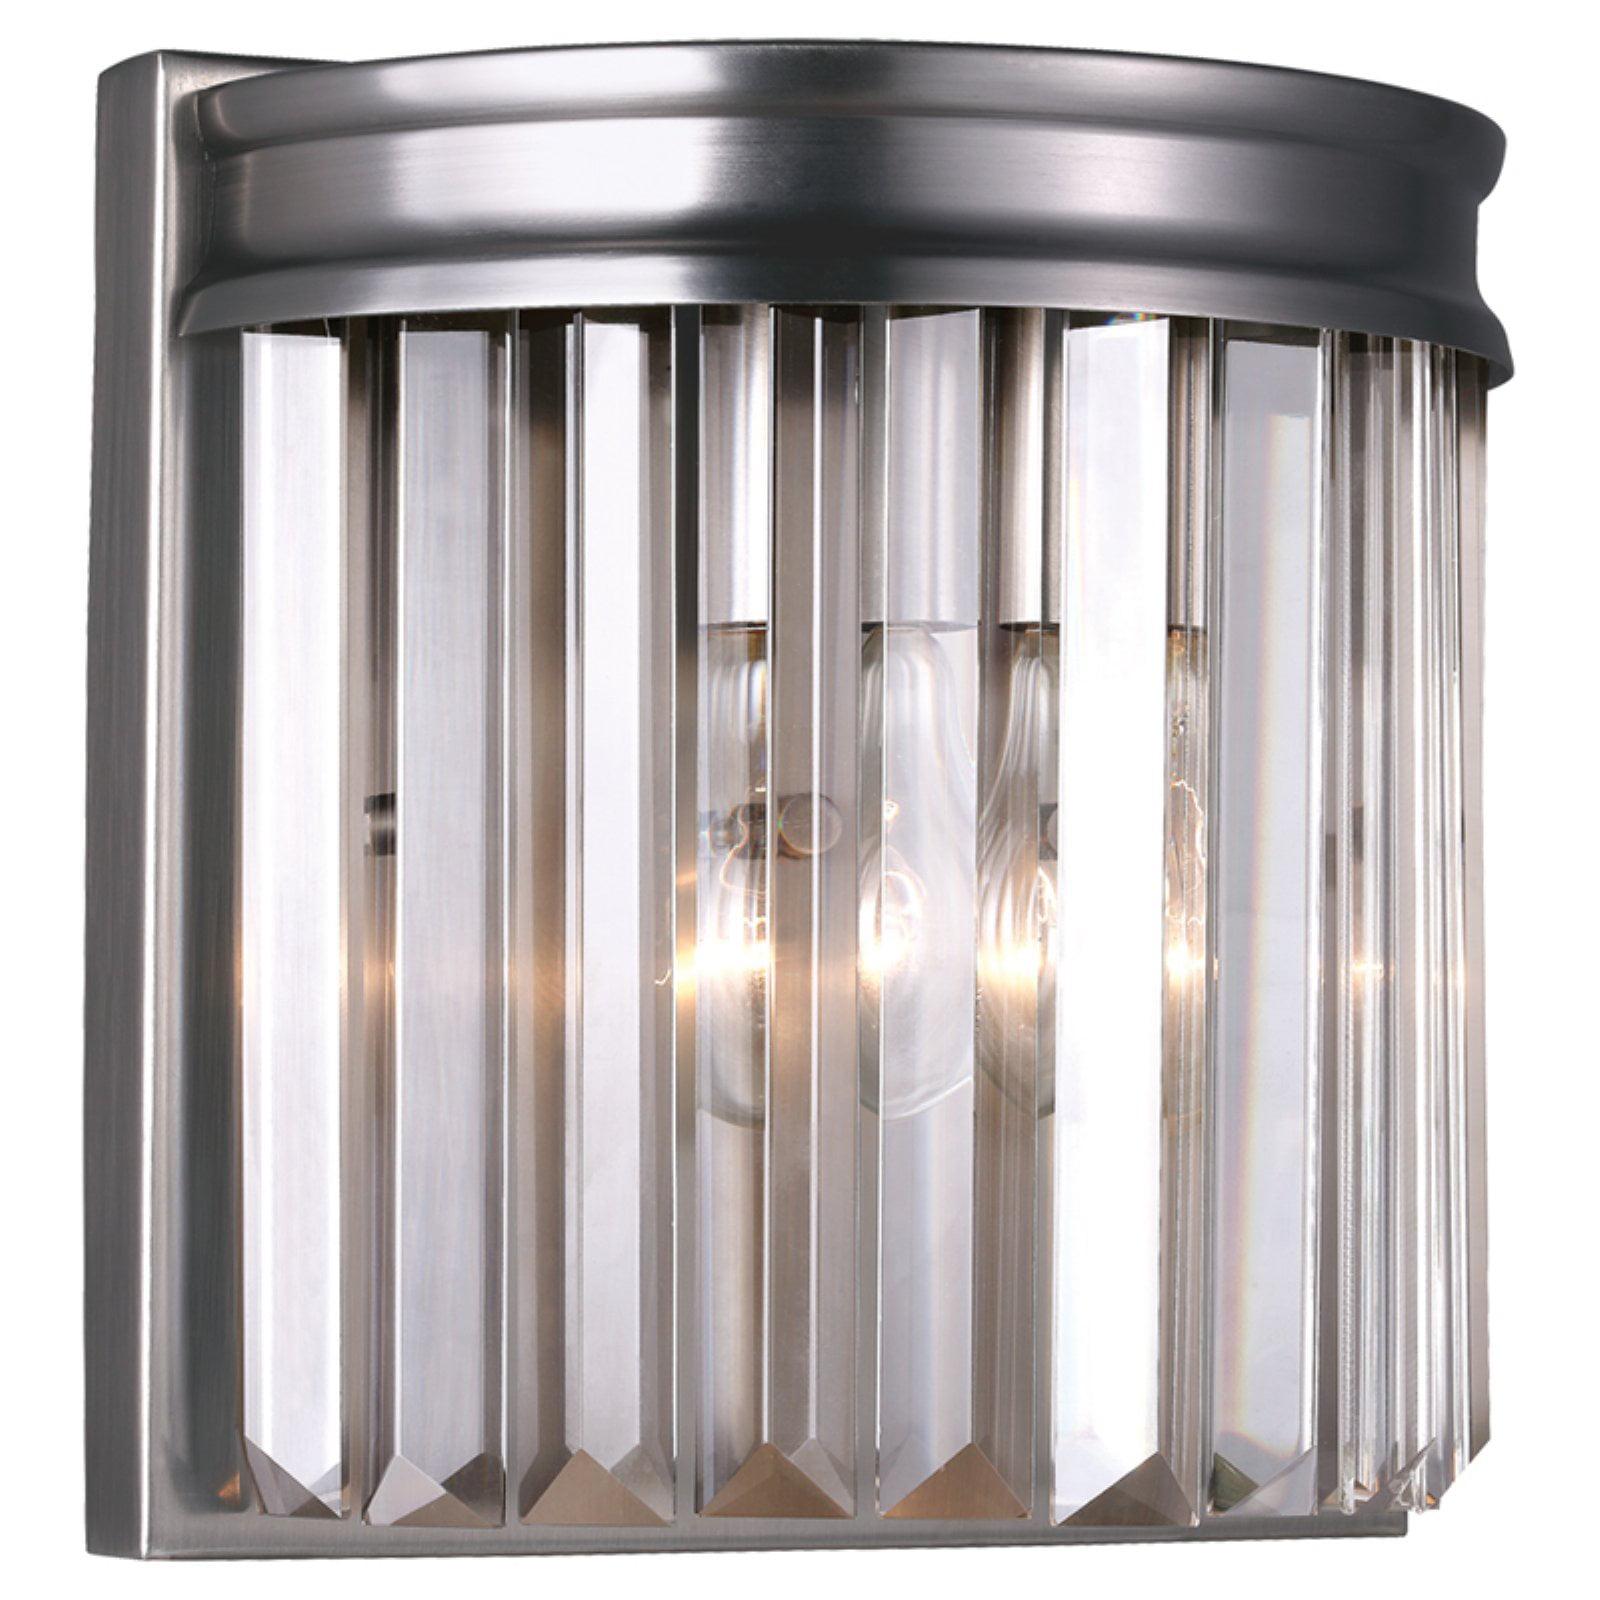 Sea Gull Lighting Carondelet 4414001 1-Light Wall / Bath Sconce